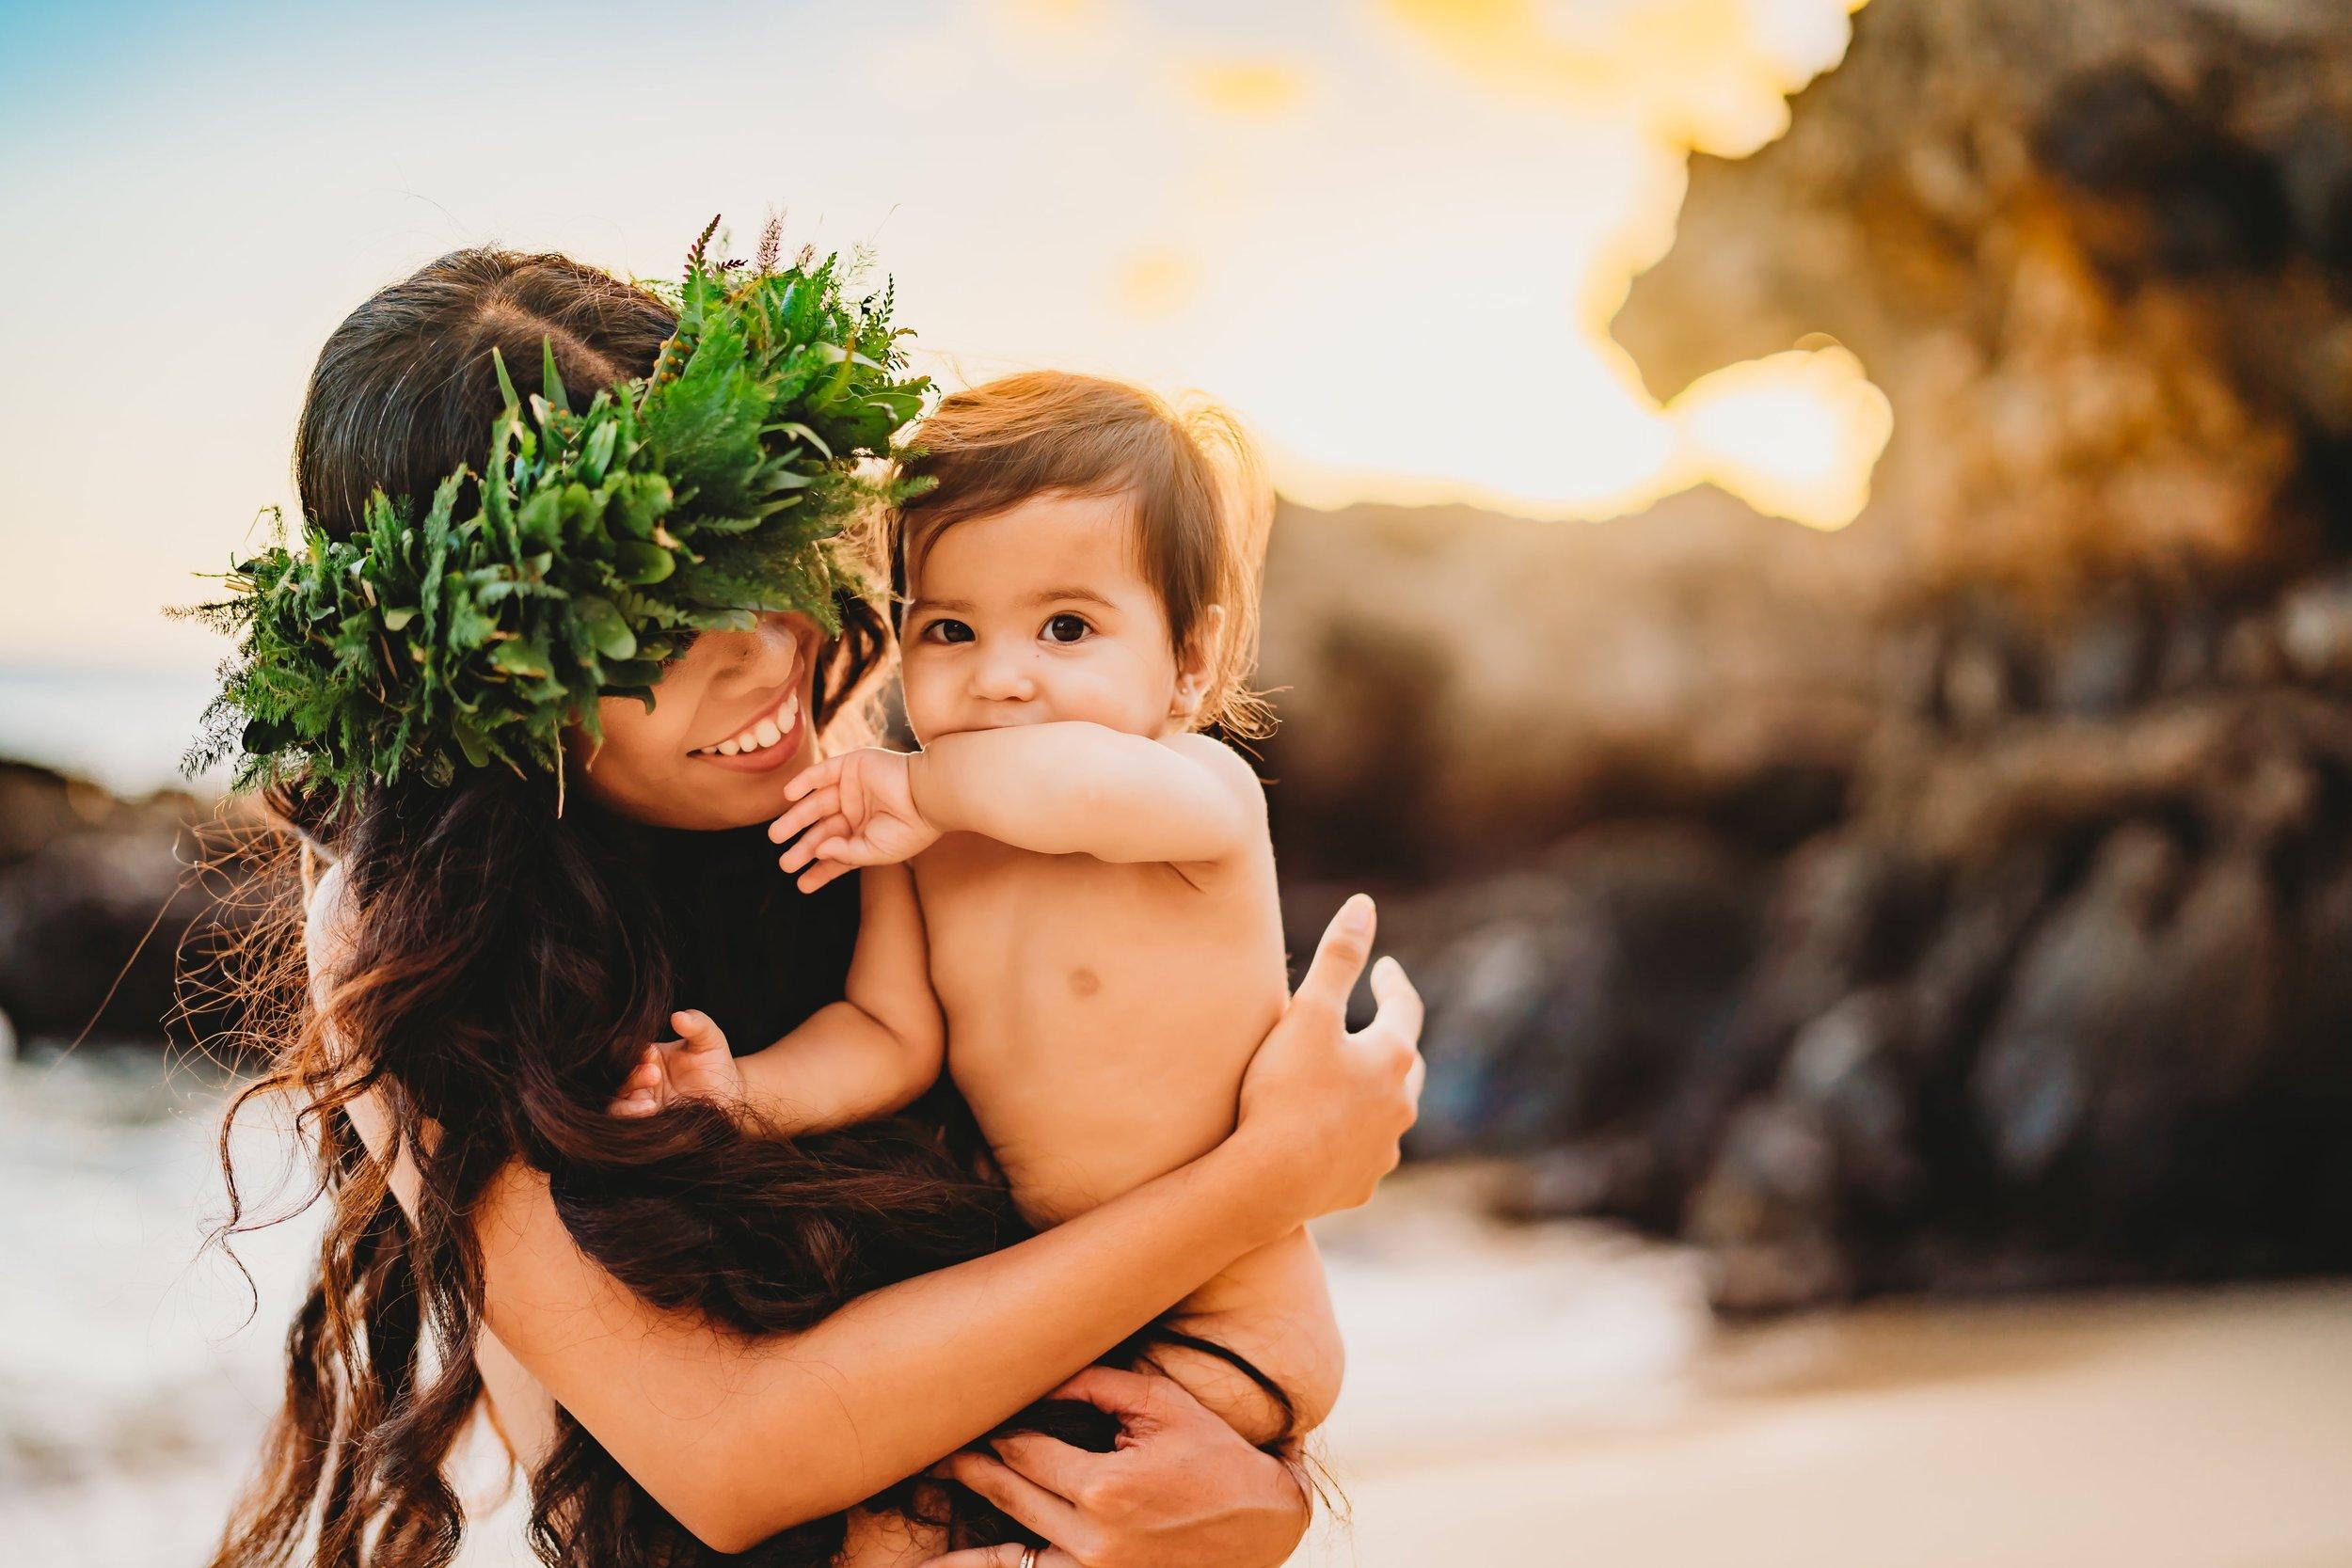 Oahu-Hawaii-Family-Photographer-haku-lei-mother-daughter-beach-session-8.jpg